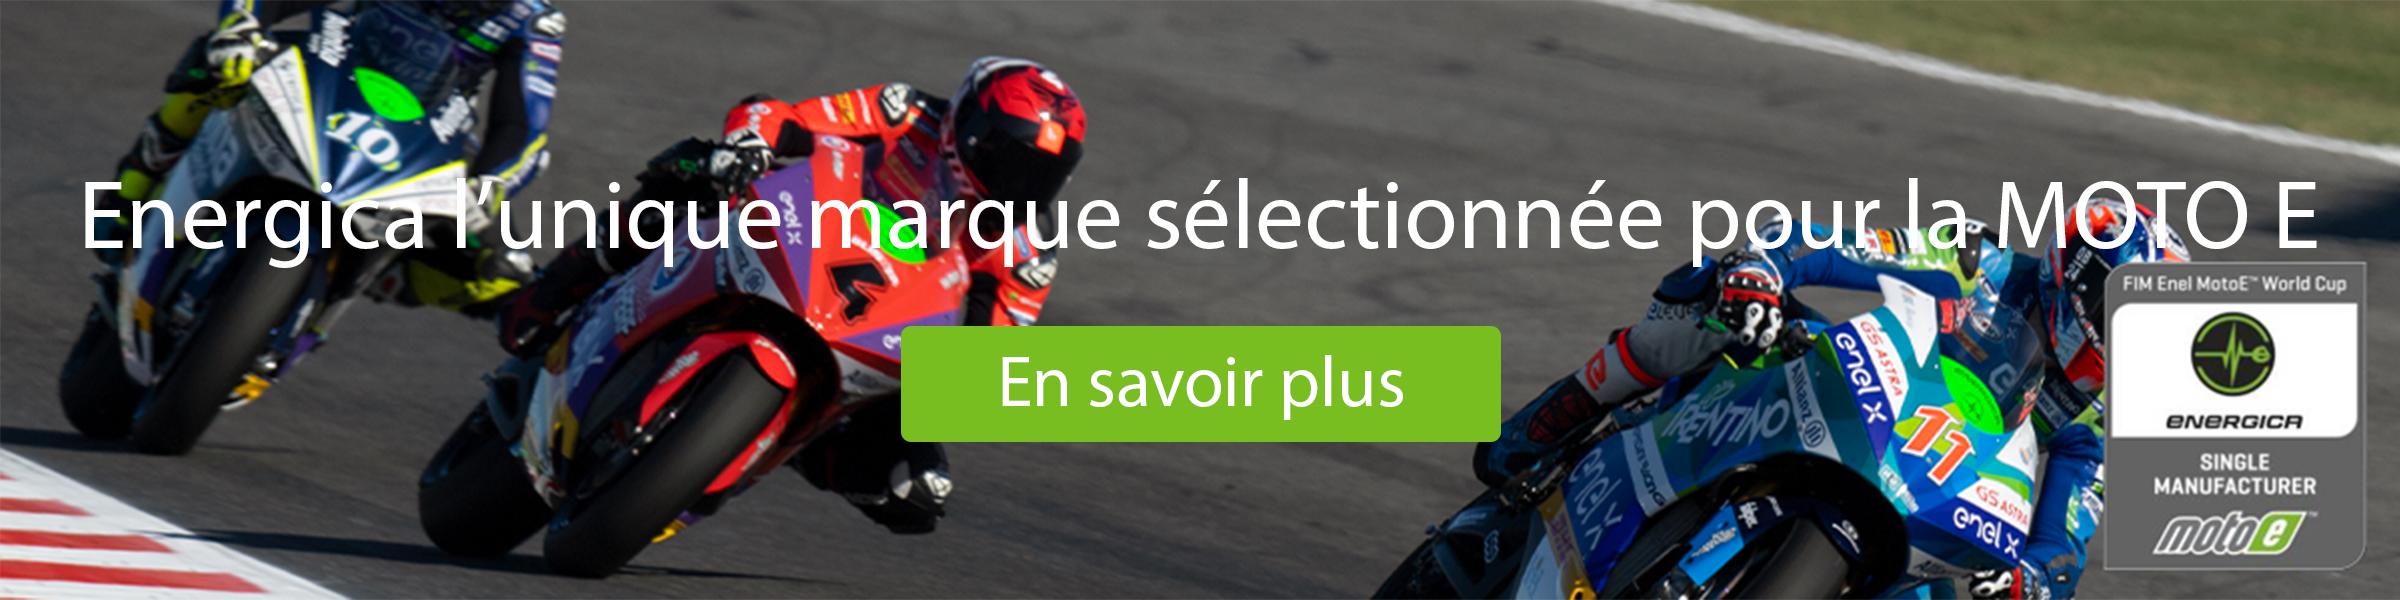 Energica France e-DC Center Lyon MOTO ELECTRIQUES